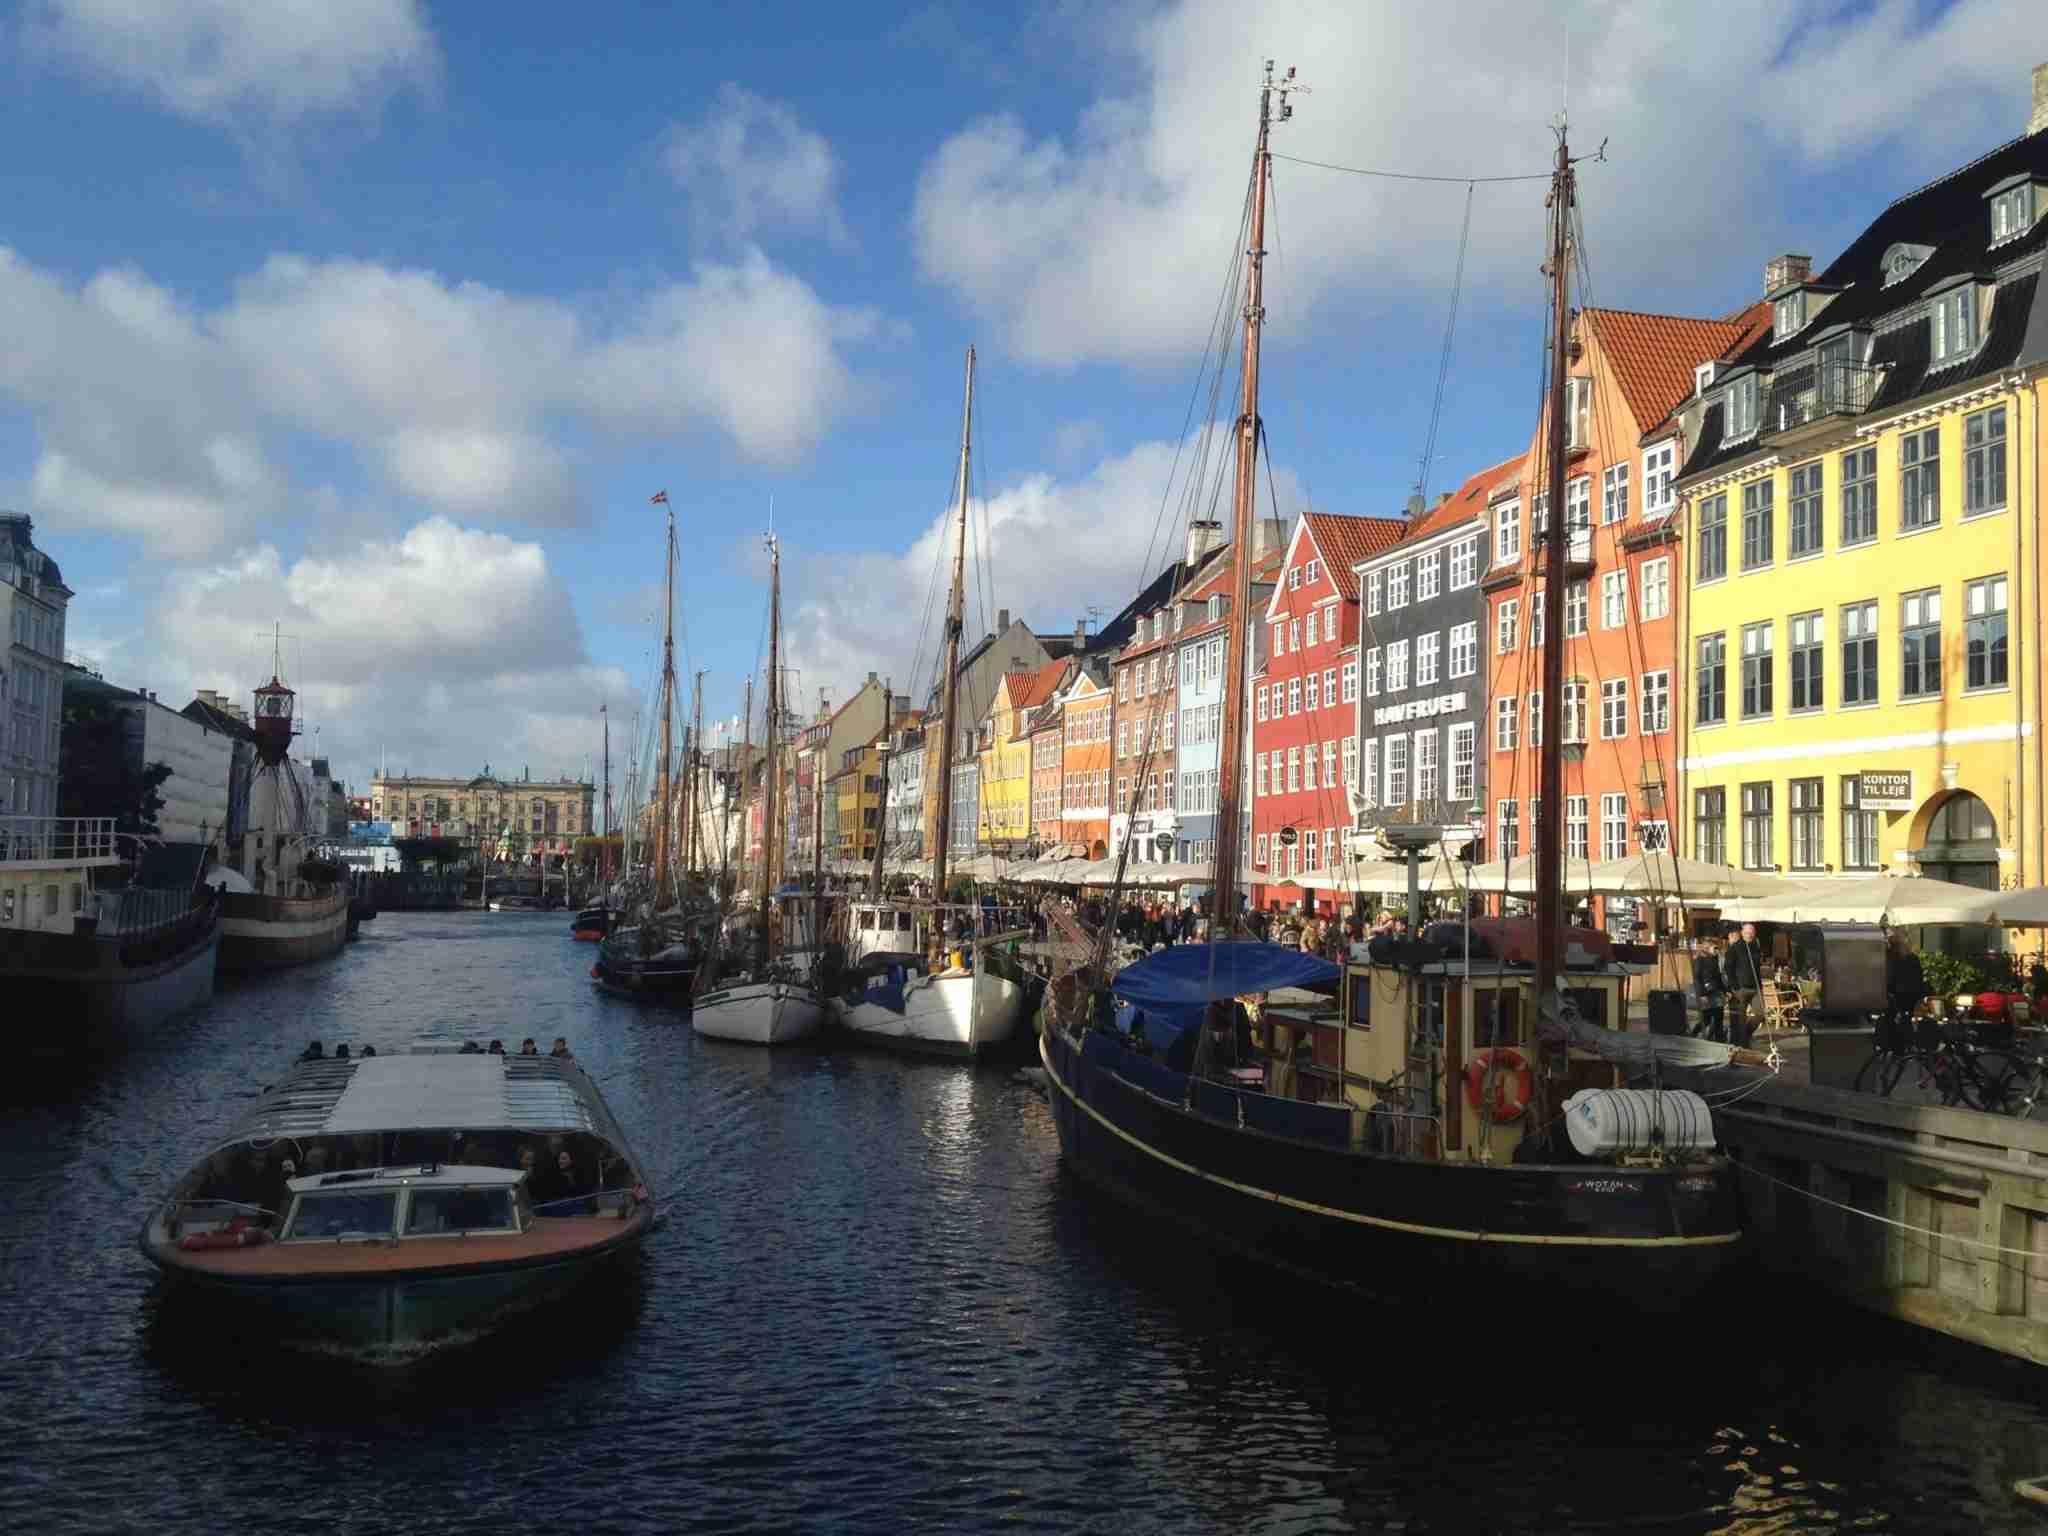 Copenhagen October 2015. (Photo by Clint Henderson/The Points Guy)